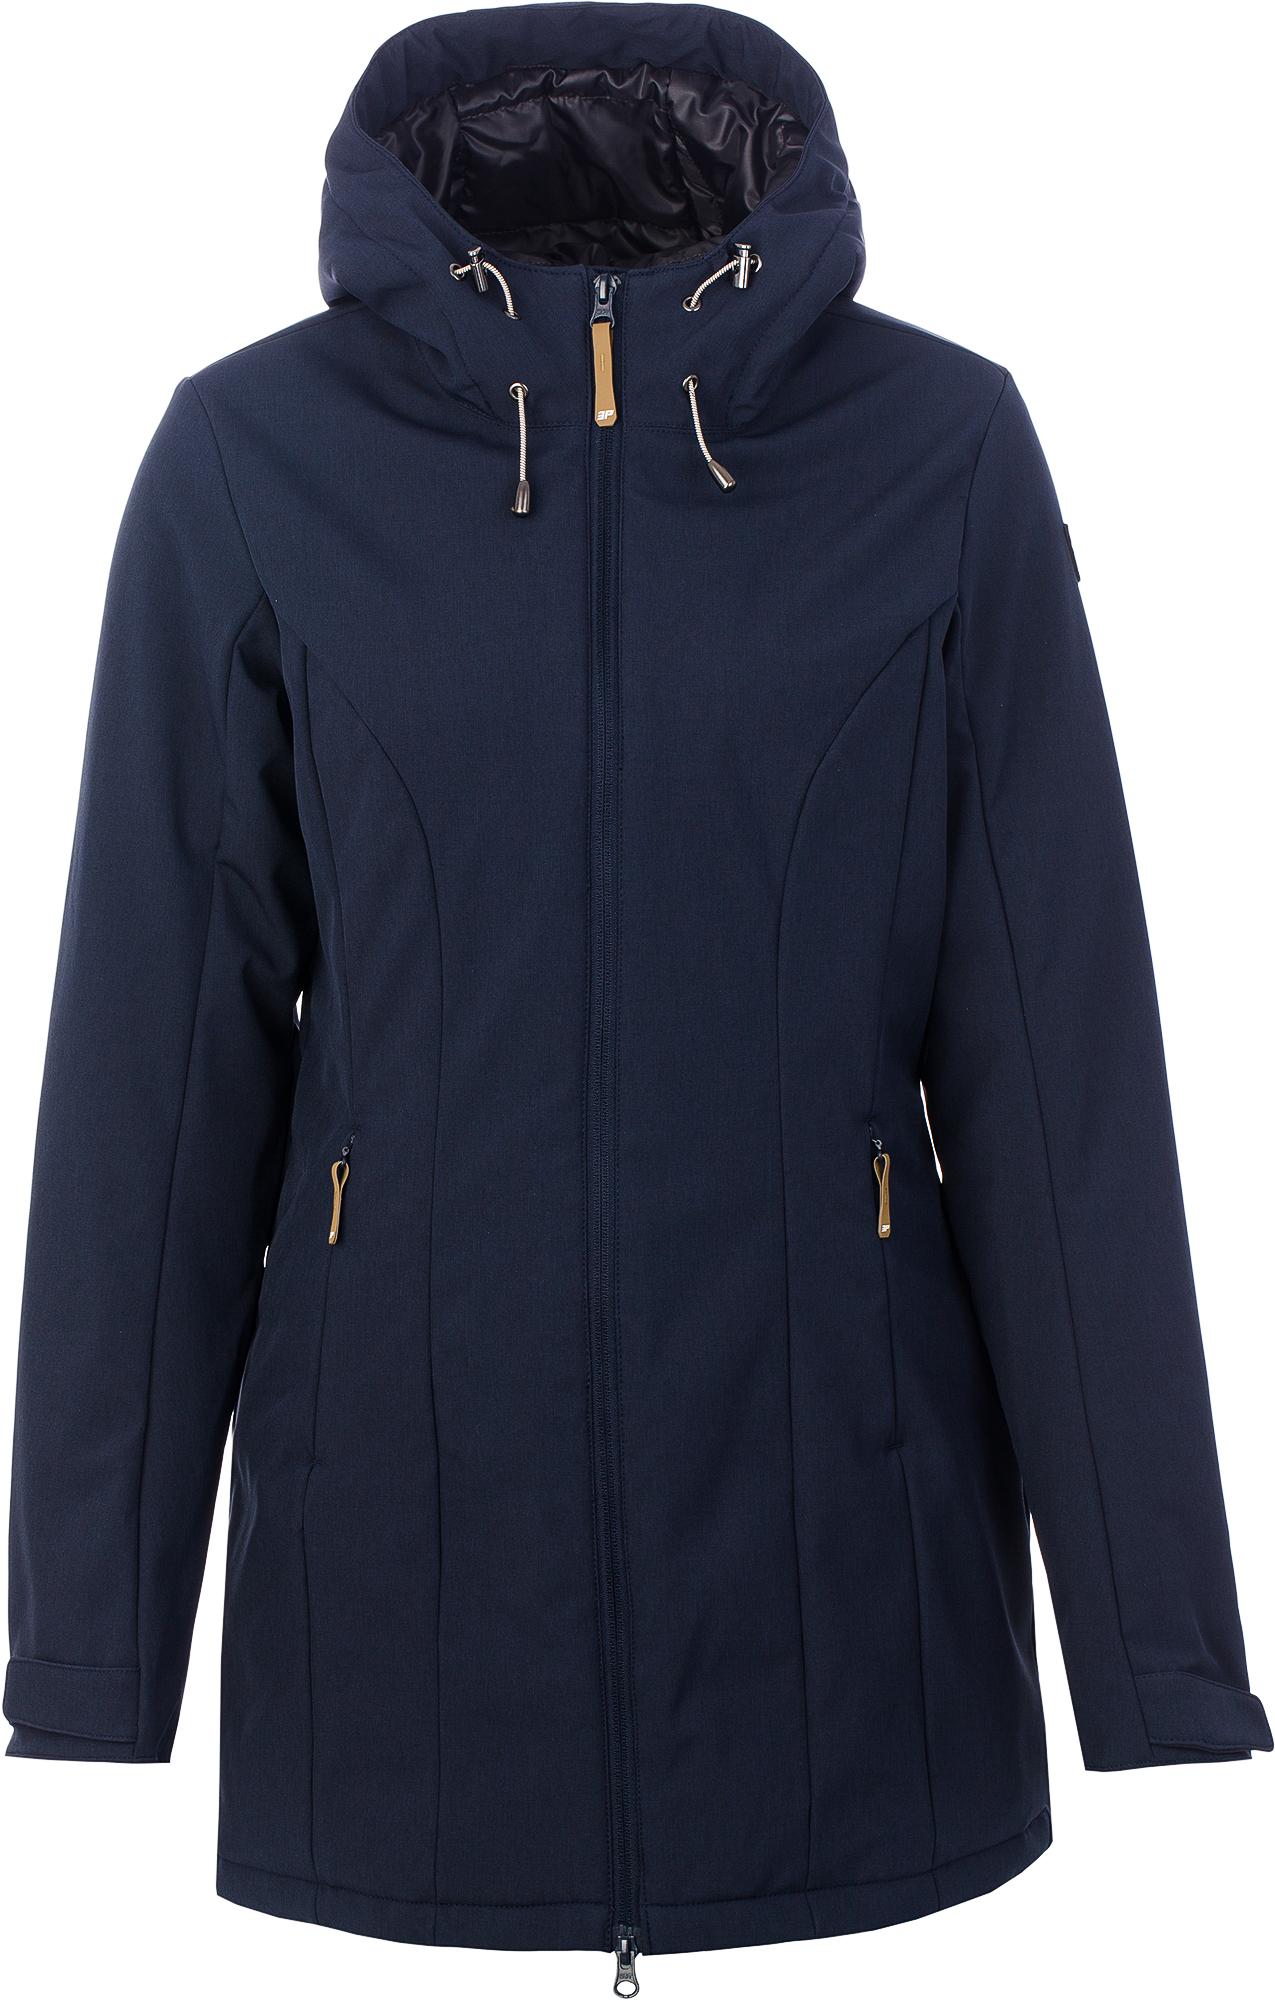 IcePeak Куртка утепленная женская IcePeak Varda, размер 52